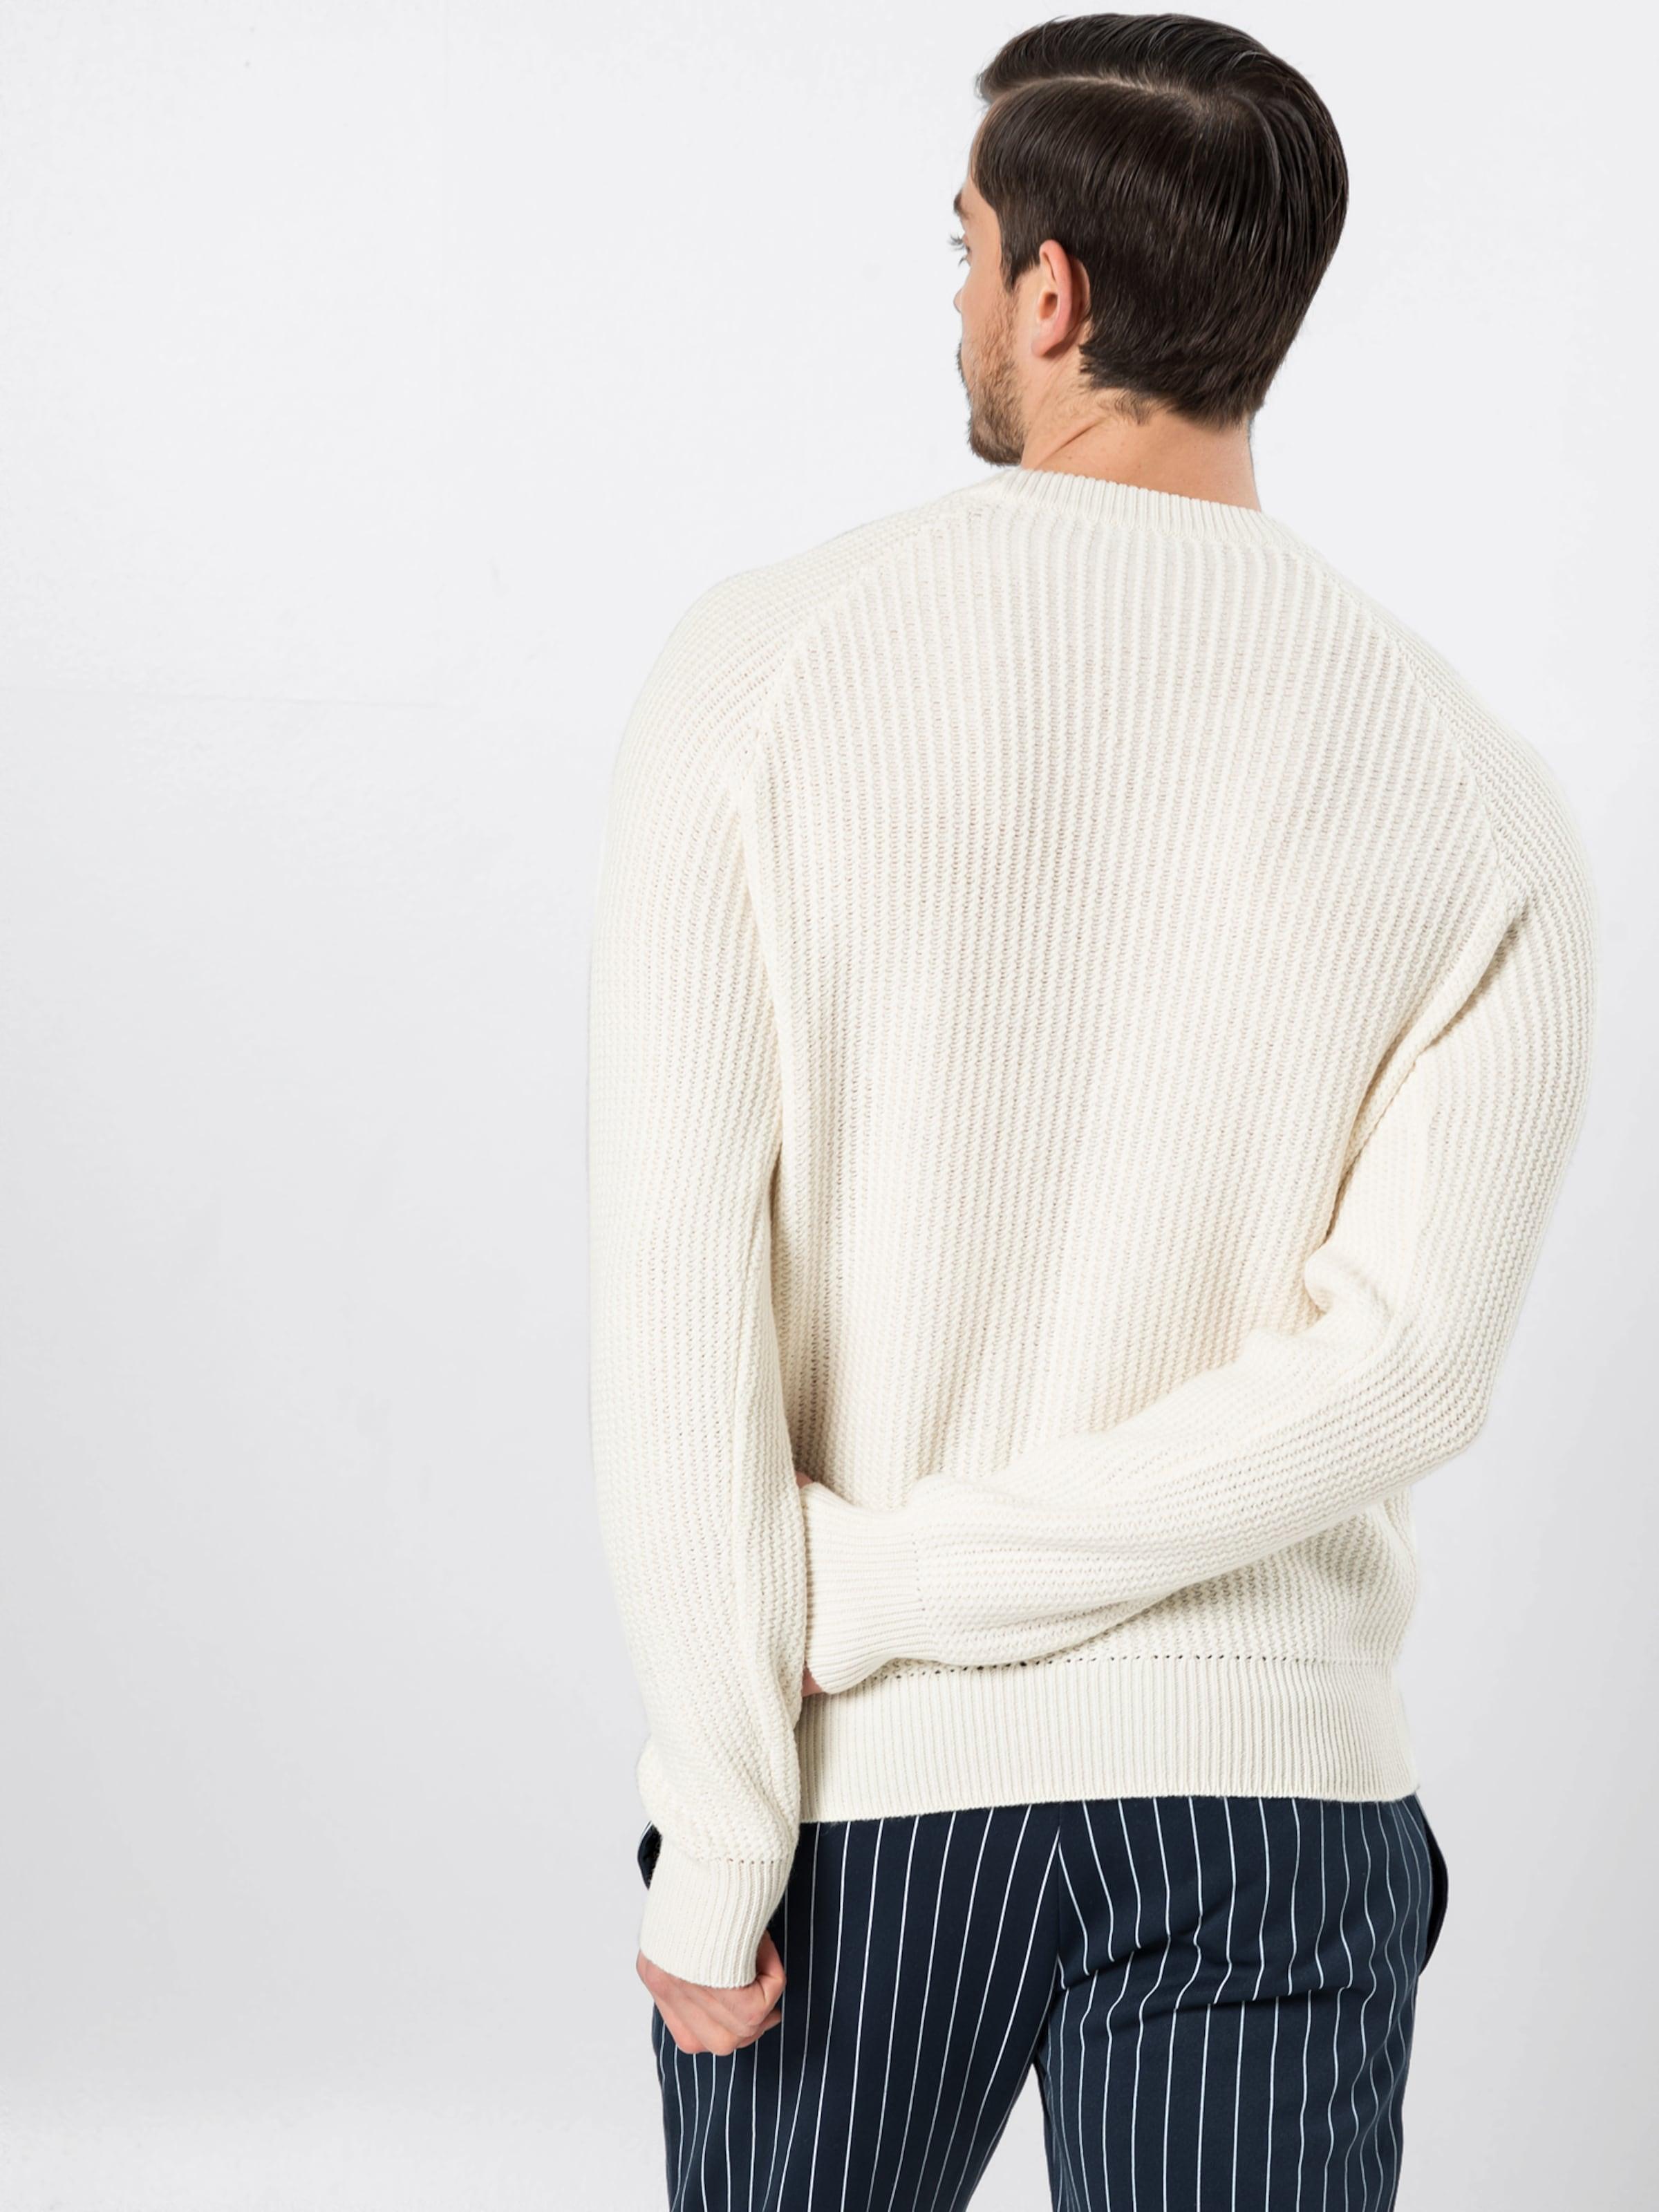 'mWave Filippa Sweater' Pullover Stitch K In Offwhite H92WDIEY